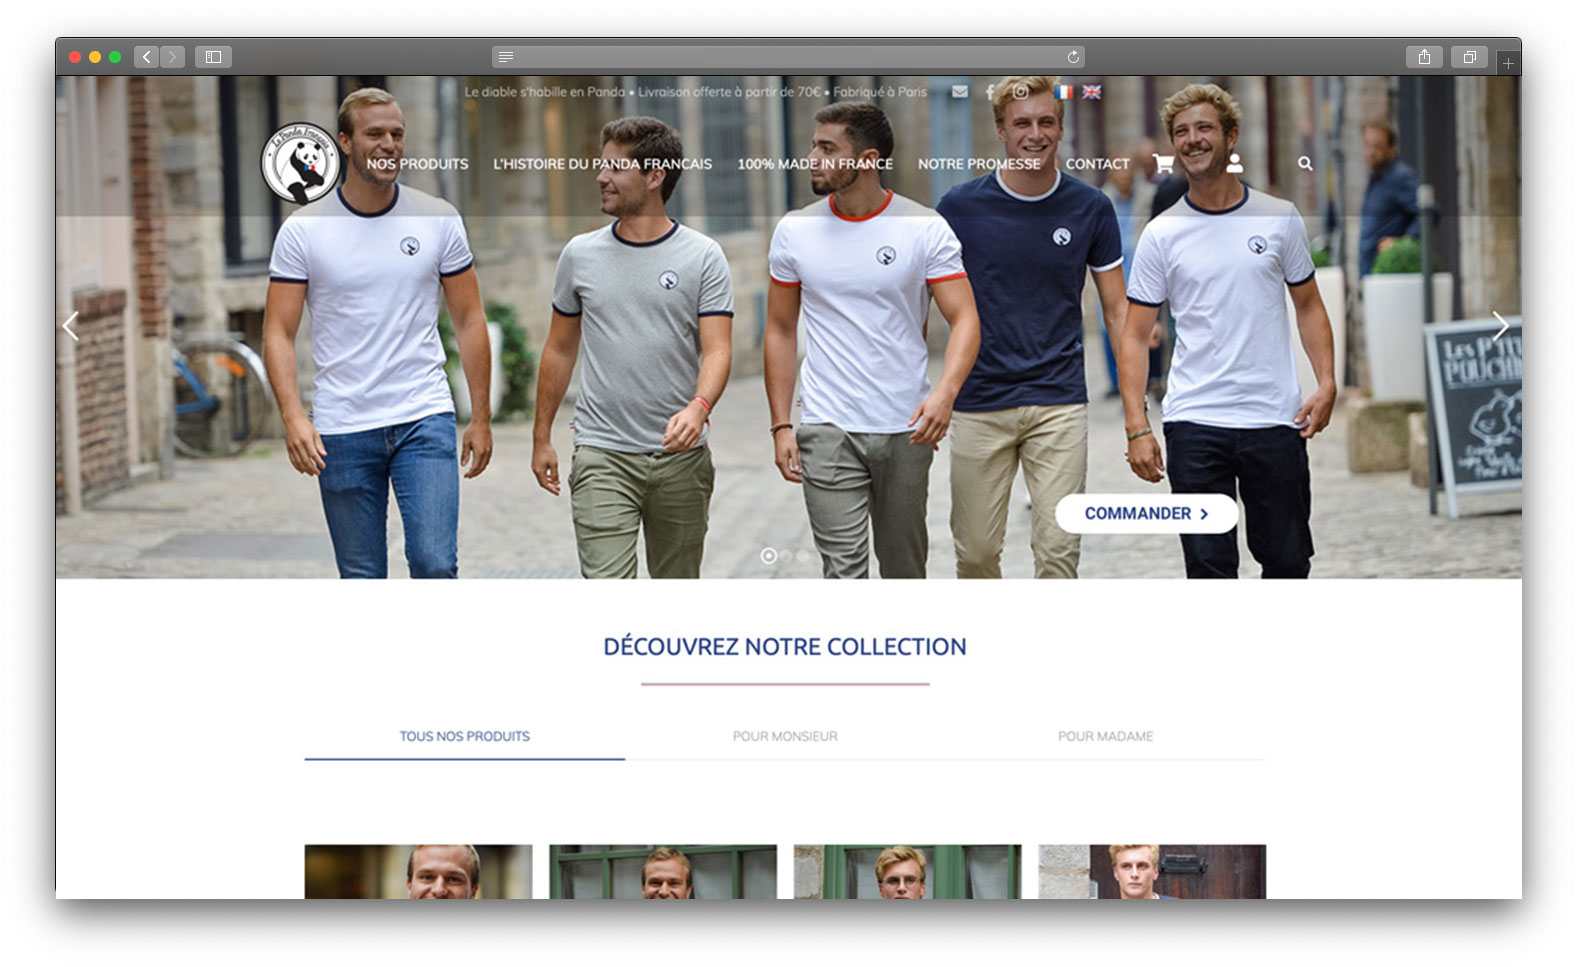 Site vitrine tshirt français